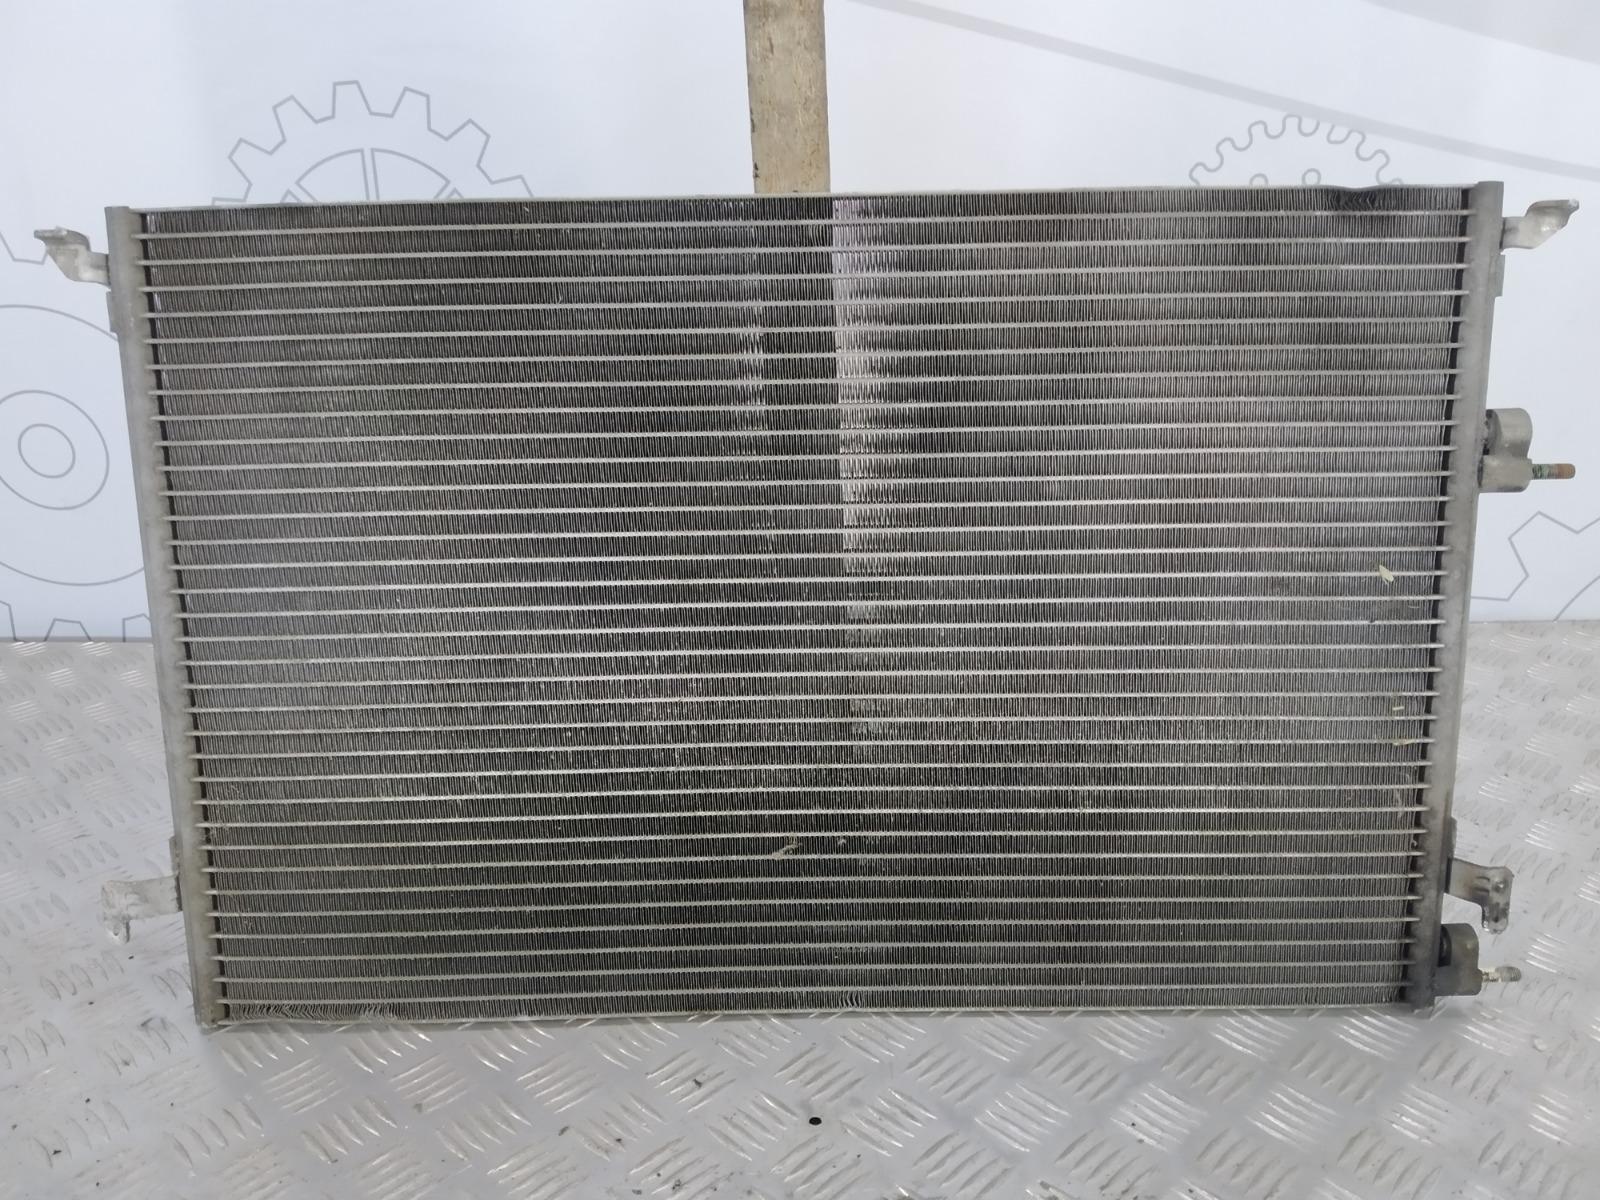 Радиатор кондиционера Saab 9-3 2.0 TI 2003 (б/у)